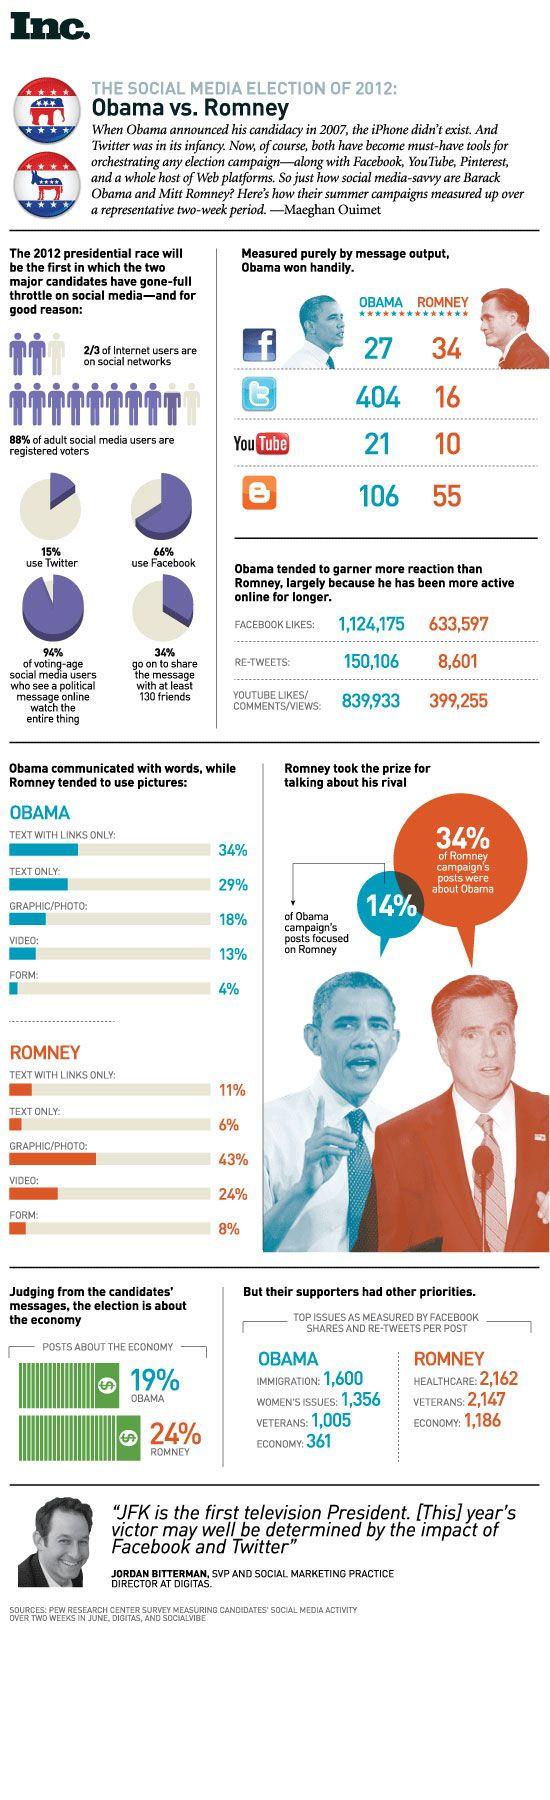 The Social Media Election of 2012: Obama vs. Romney #infographic